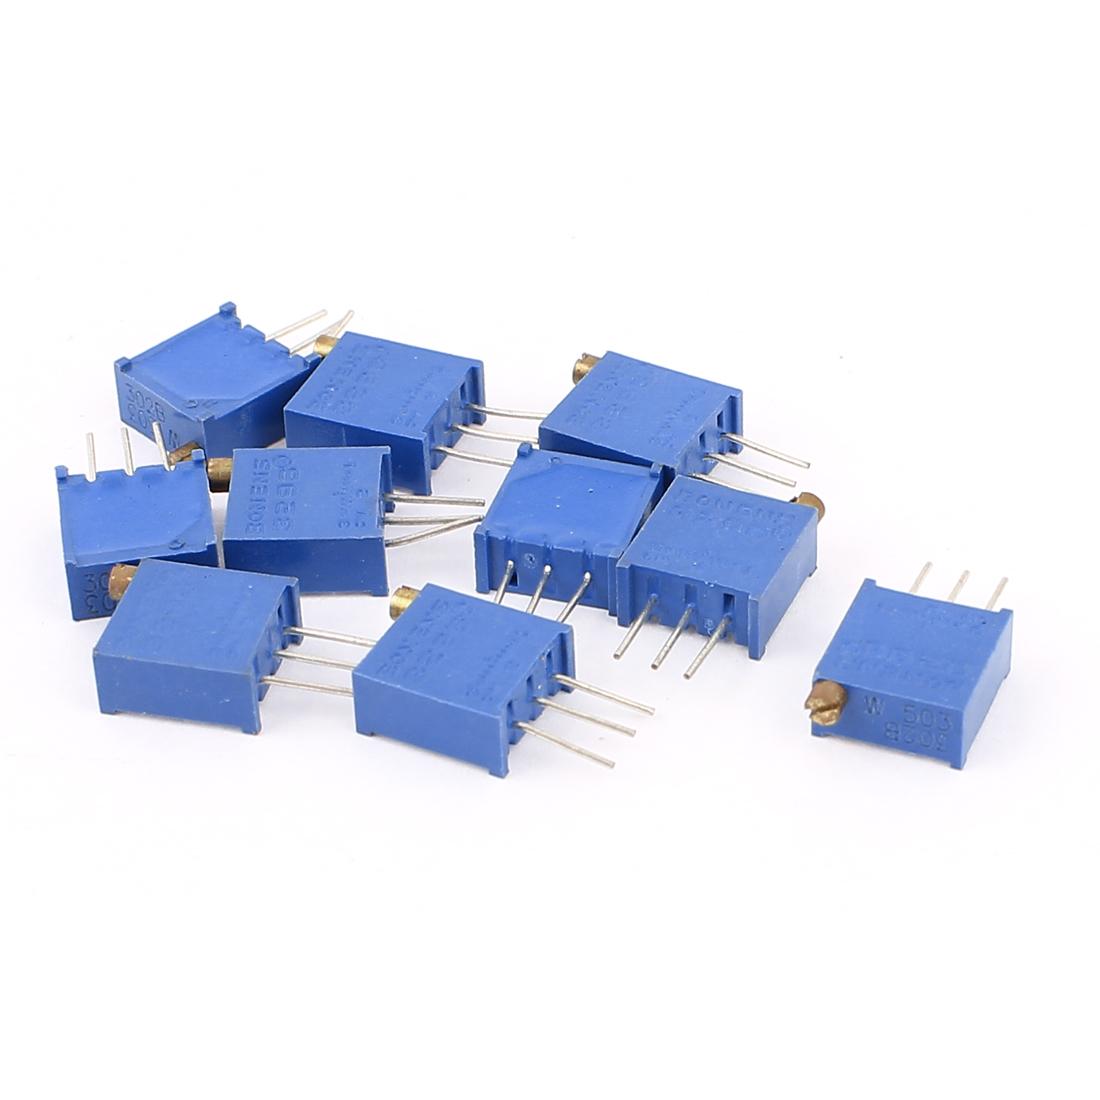 10Pcs Potentiometer Trimmer Variable Resistor Resistive 3296W 503 50K